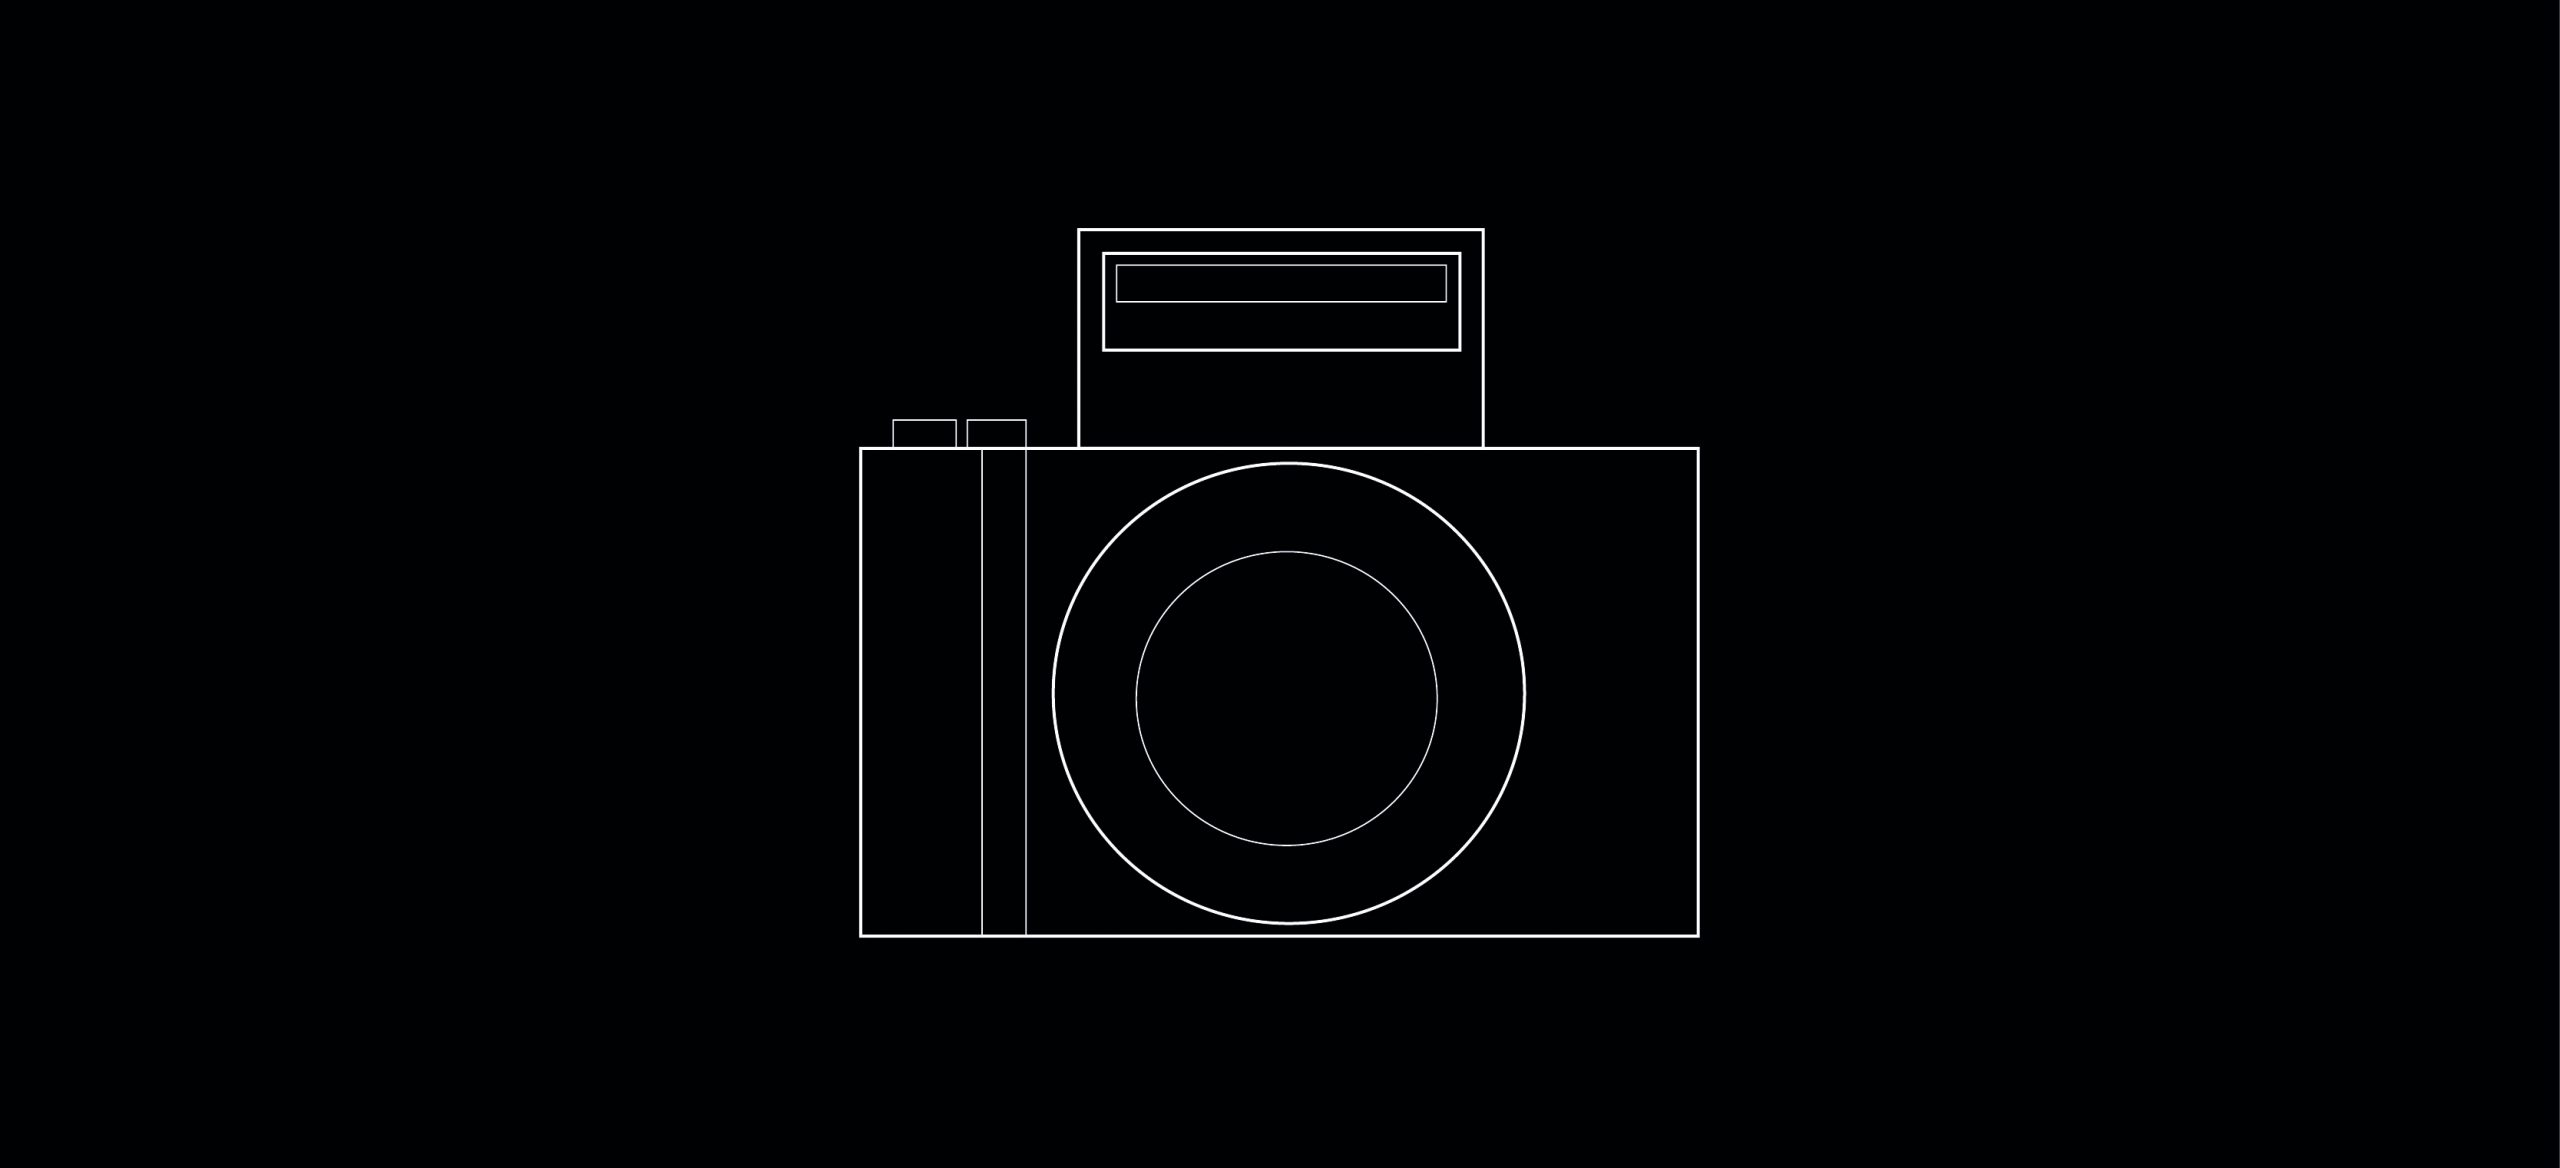 Profesyonel Fotograf cekmek